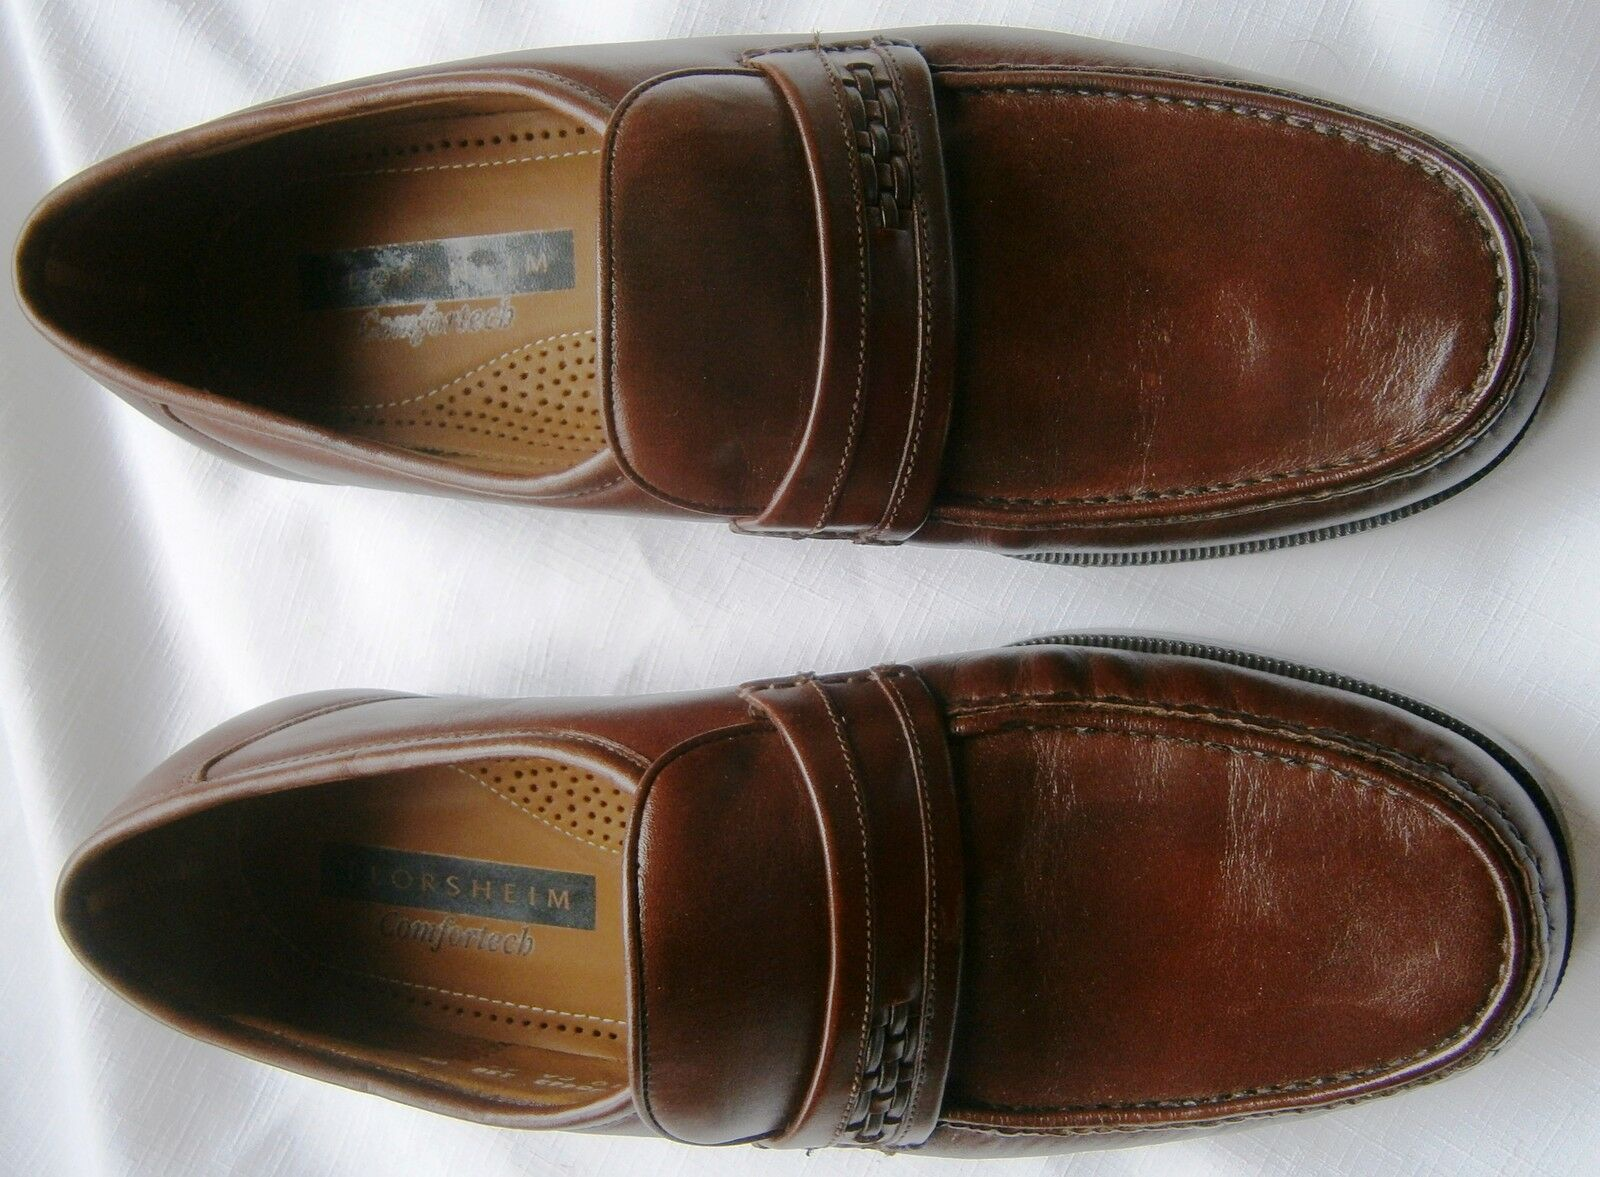 BRAND NEW Florsheim Comfortech Tan LEATHER Loafer Dress Scarpe Uomo 9 1/2 Med.